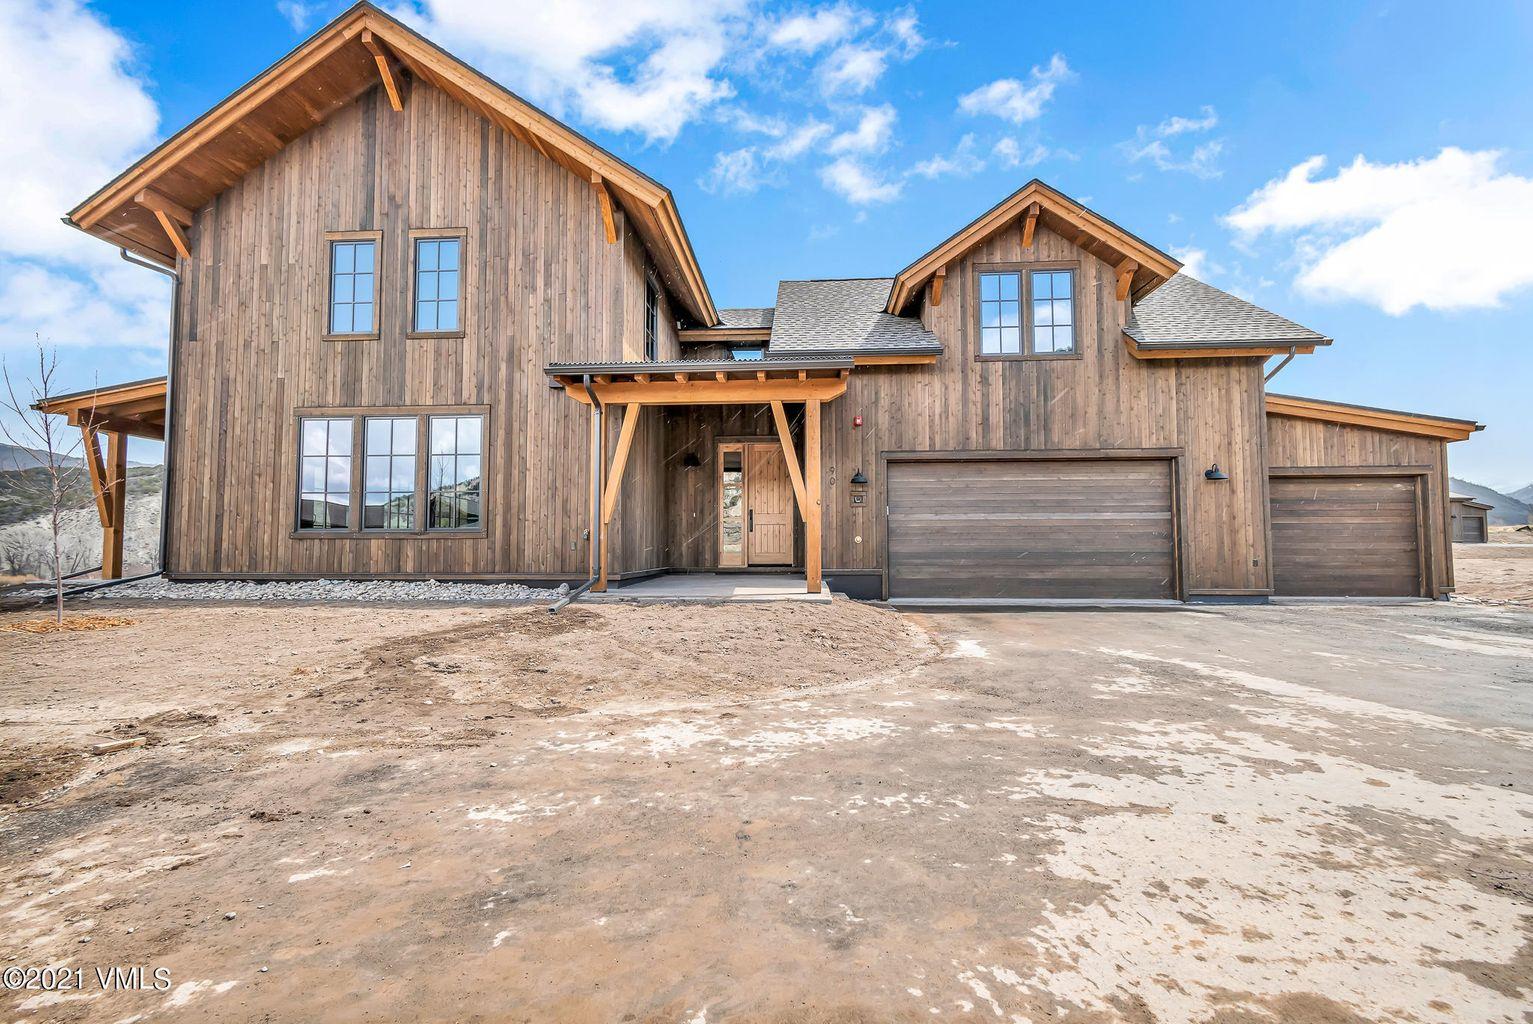 New house, Borah 129